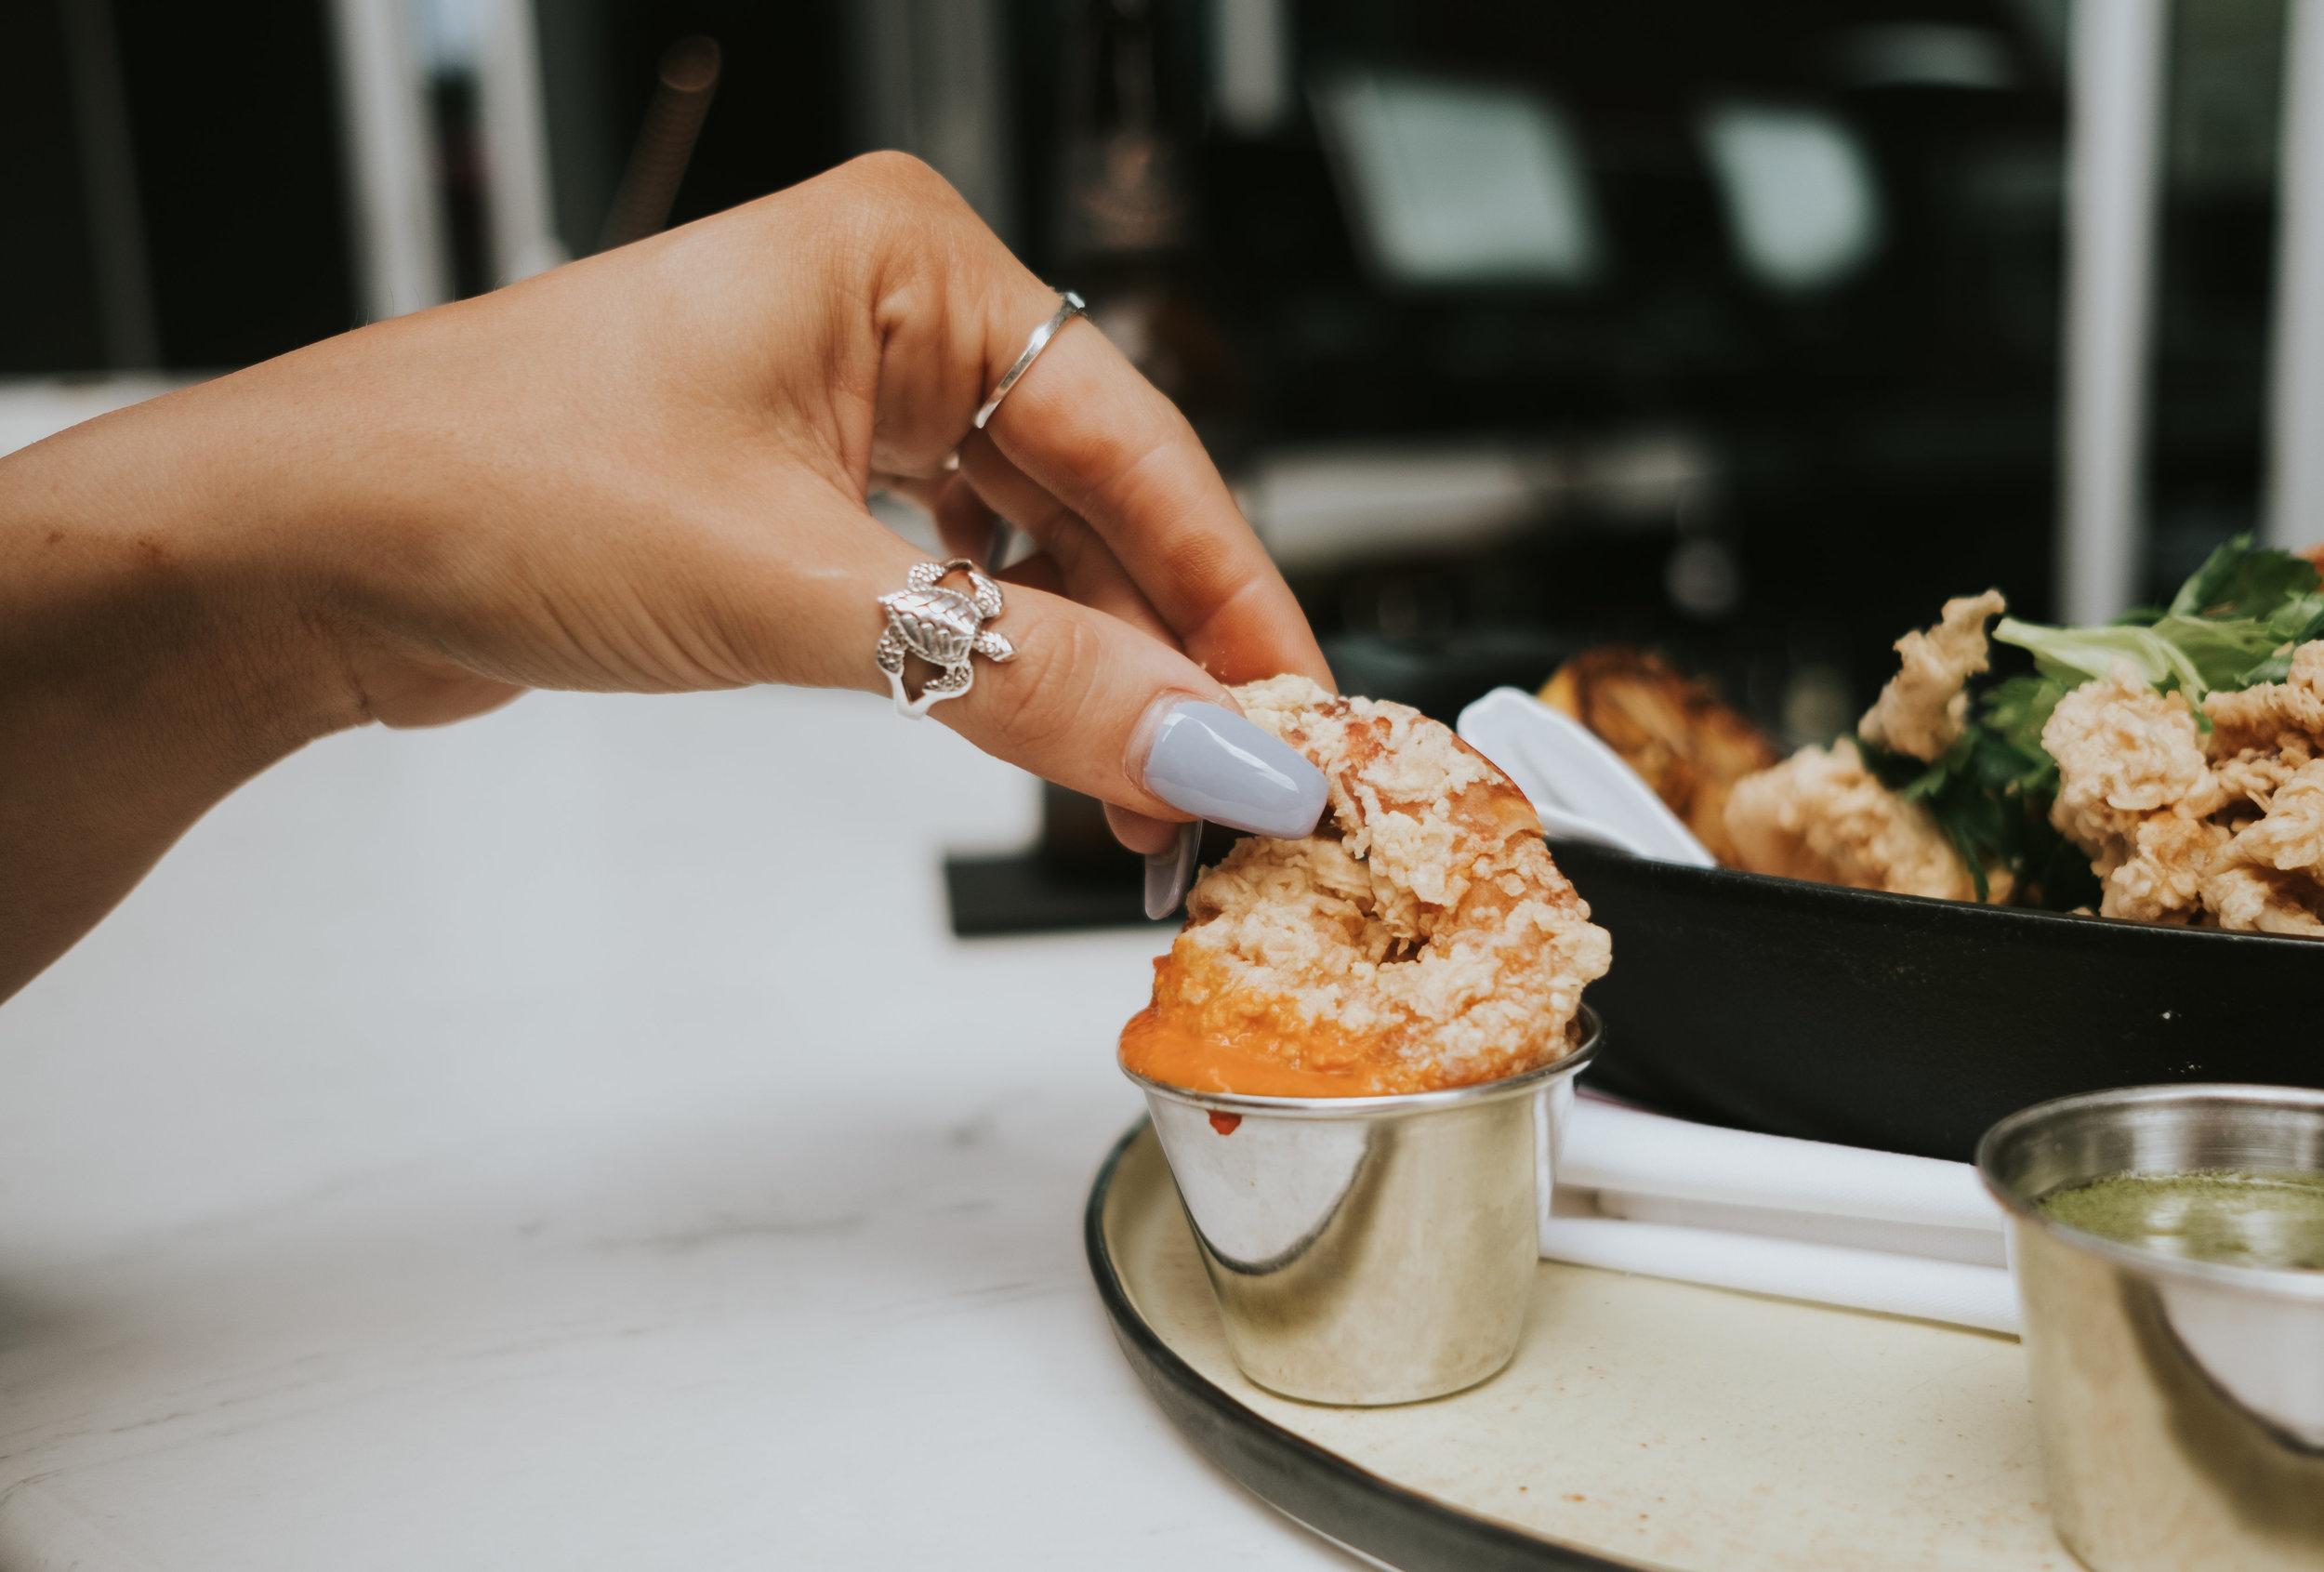 Osteria update 1 31-Franklin Manor food-0060.jpg